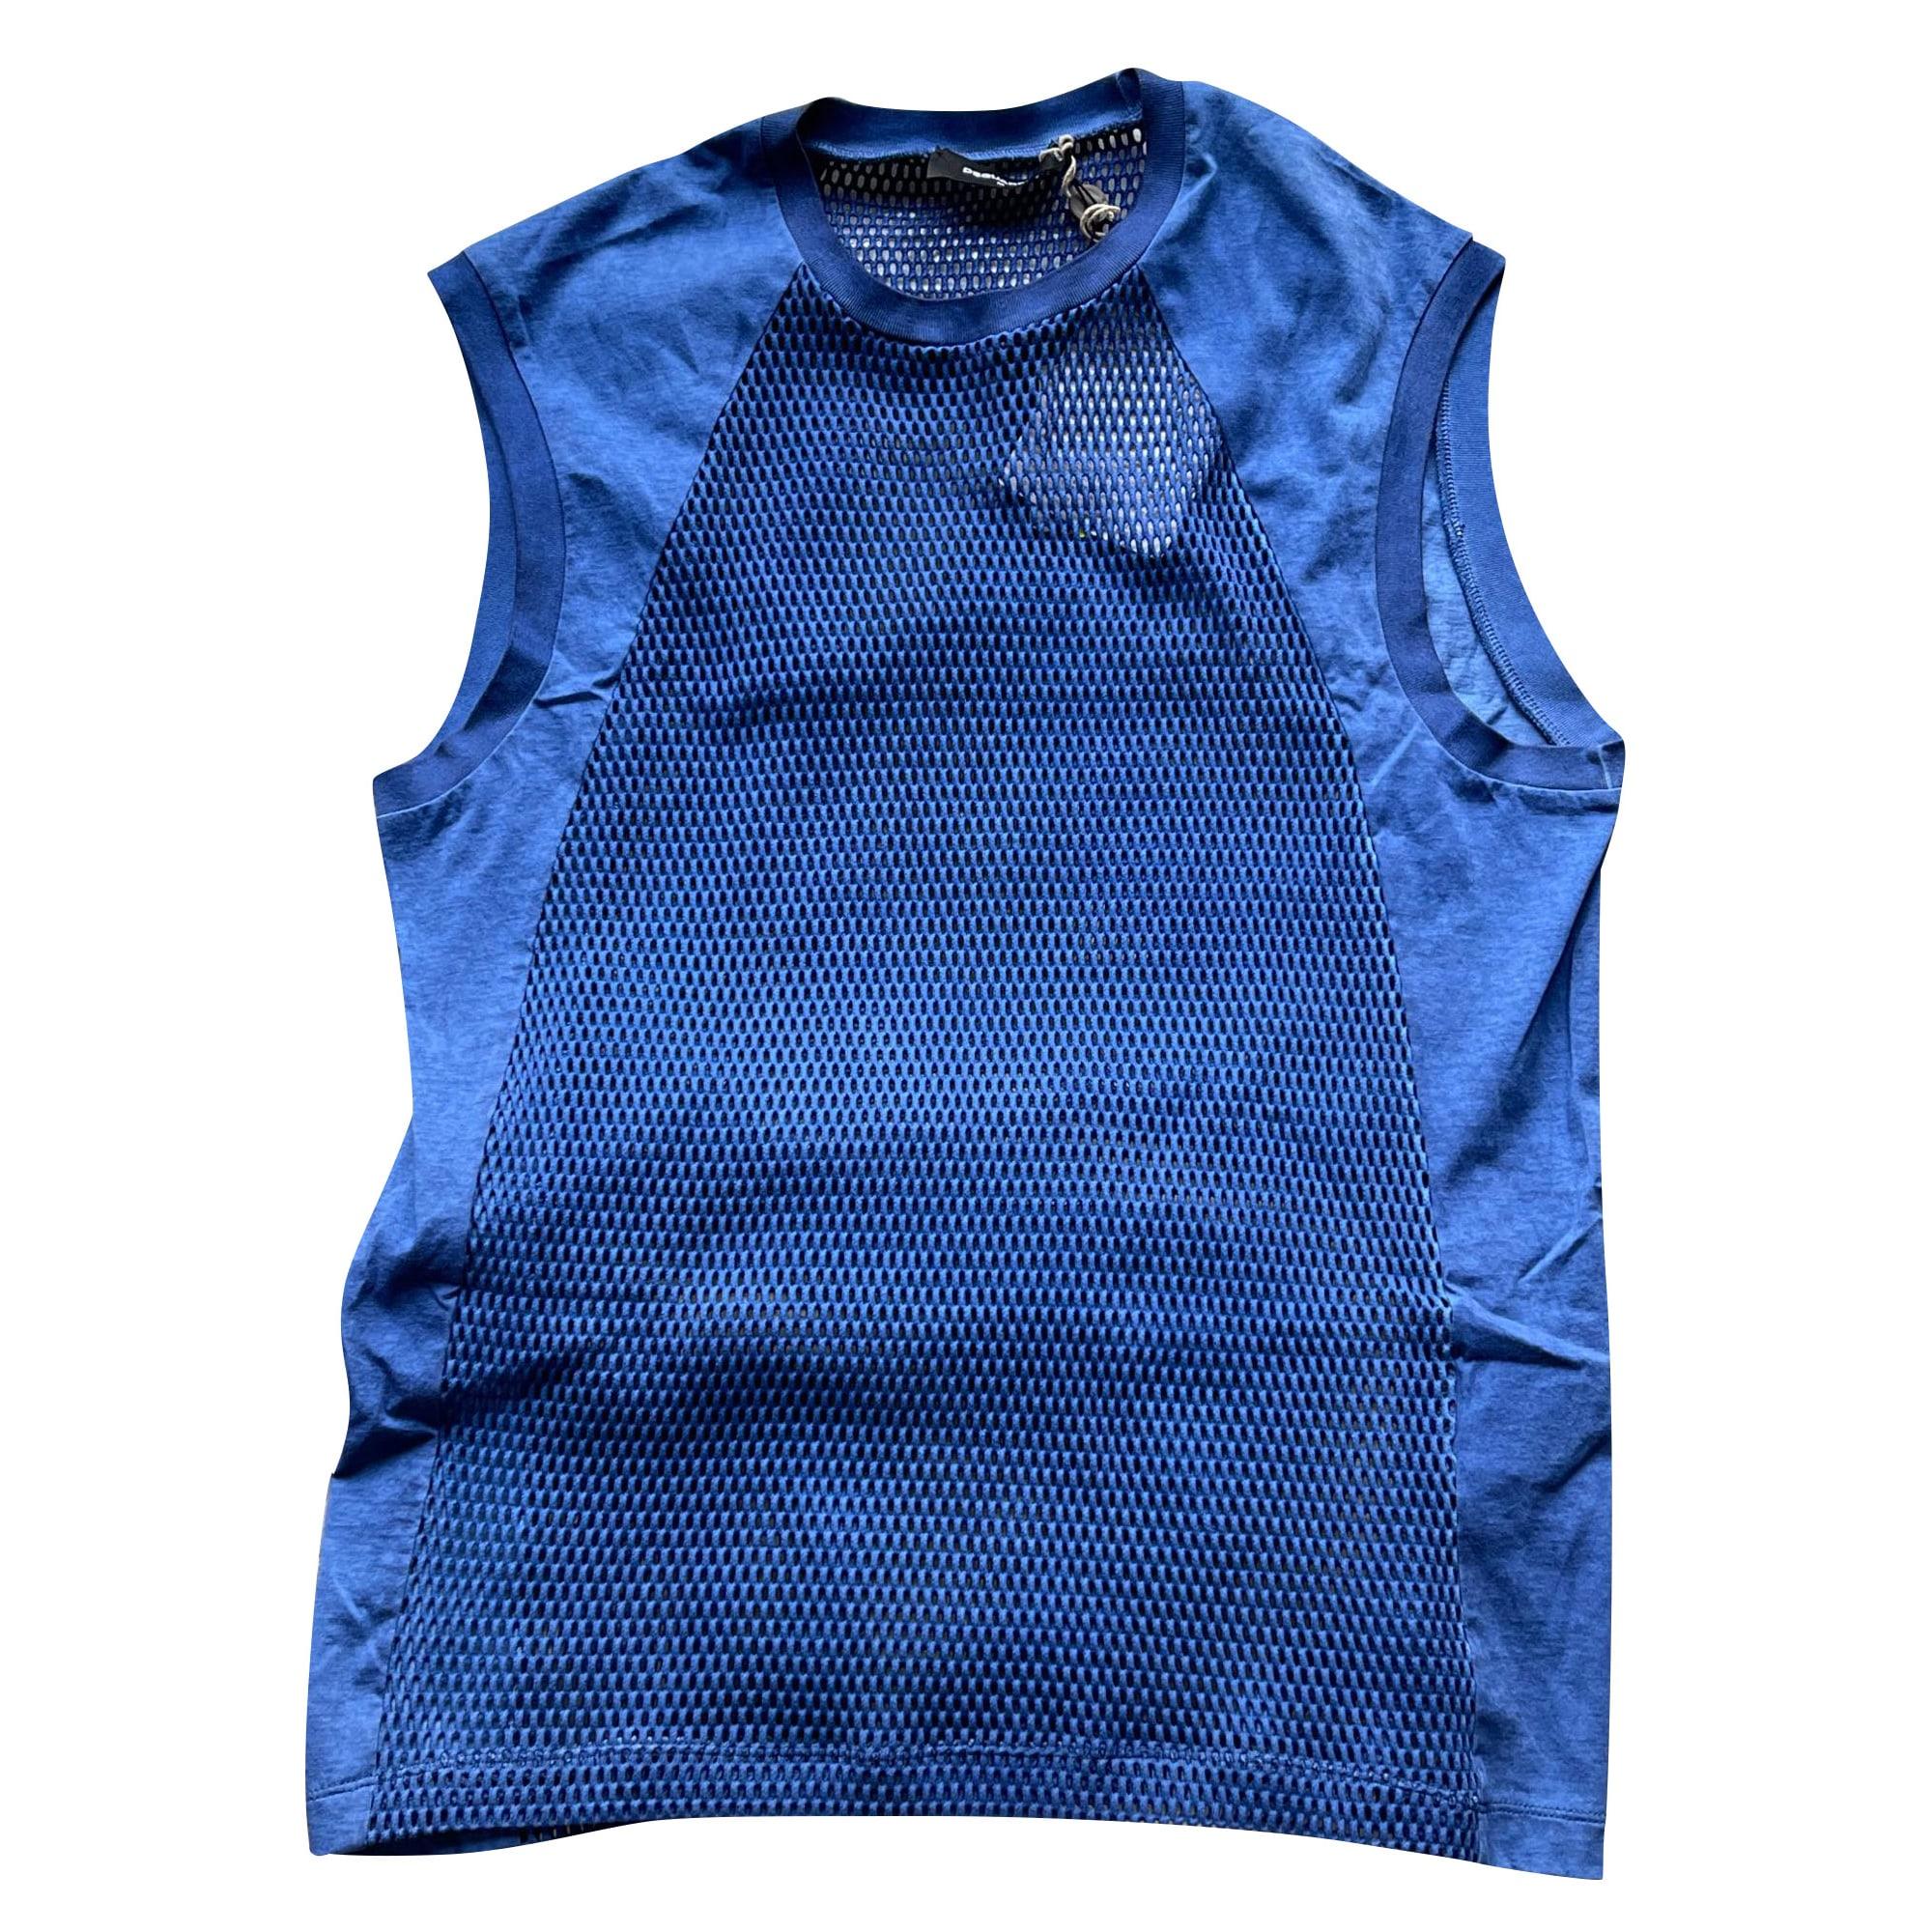 Tee-shirt DSQUARED2 Bleu, bleu marine, bleu turquoise